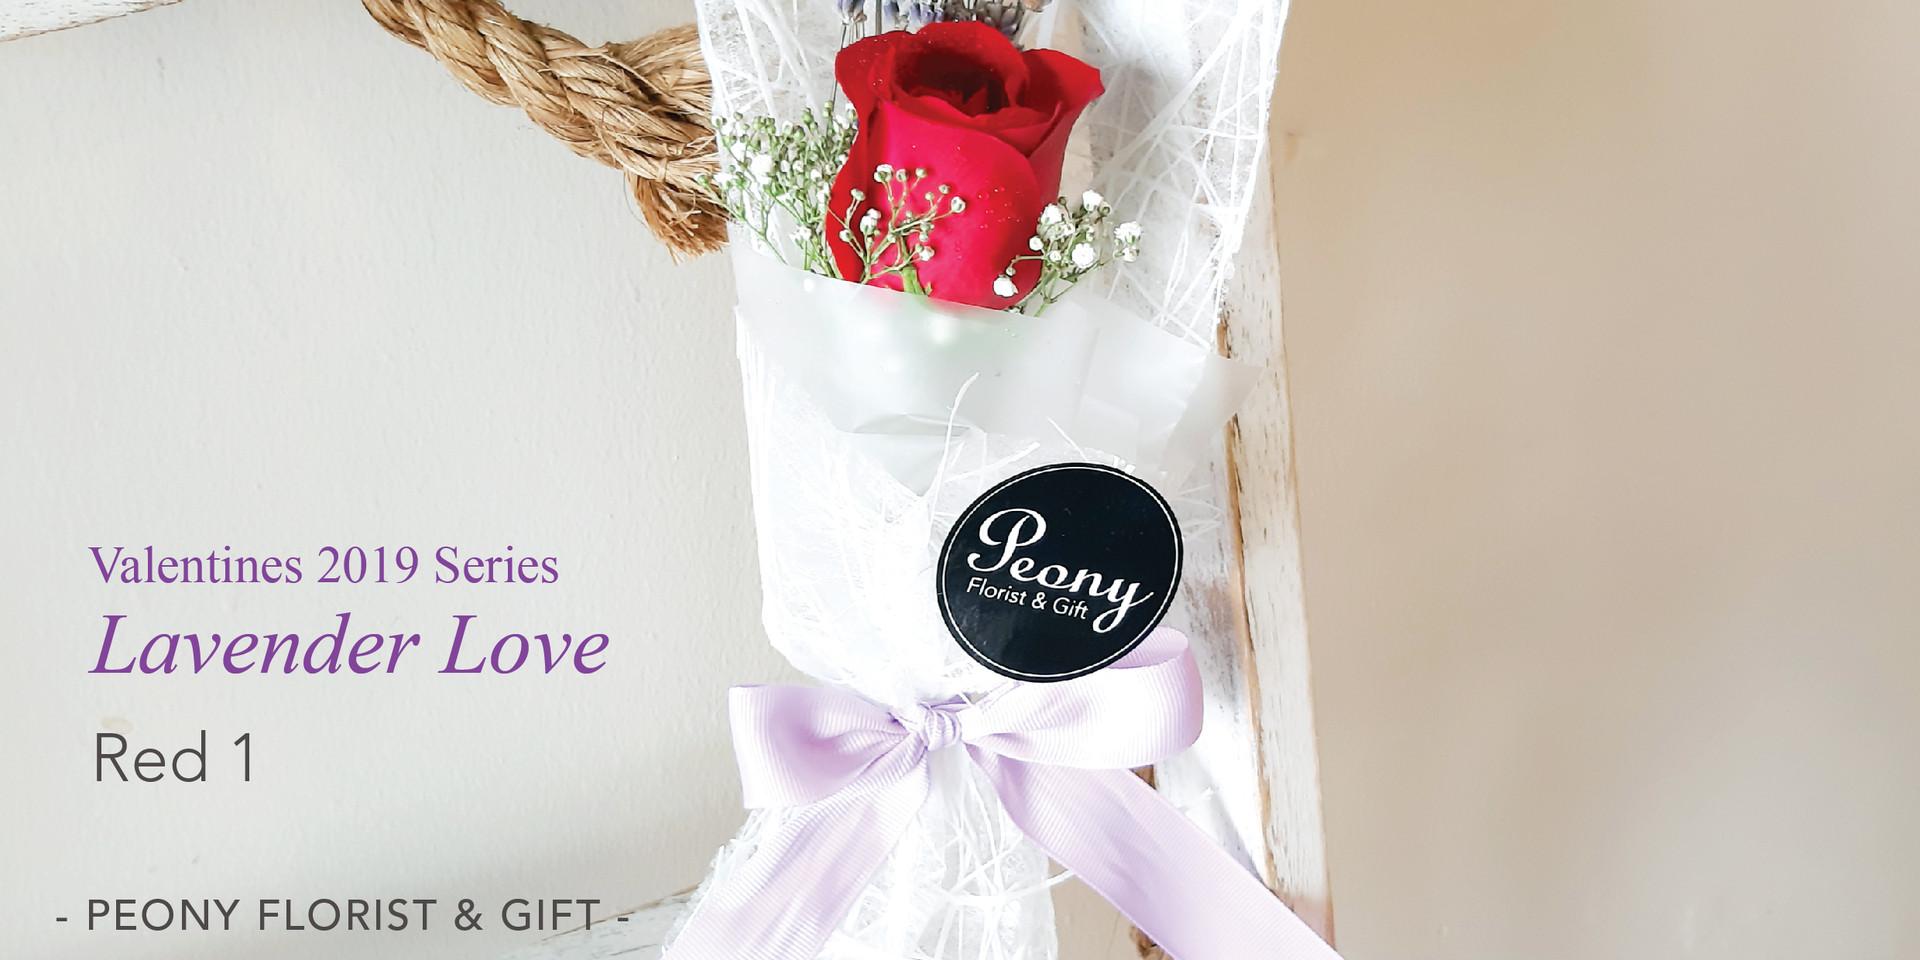 Red 1-Lavender Love 2019